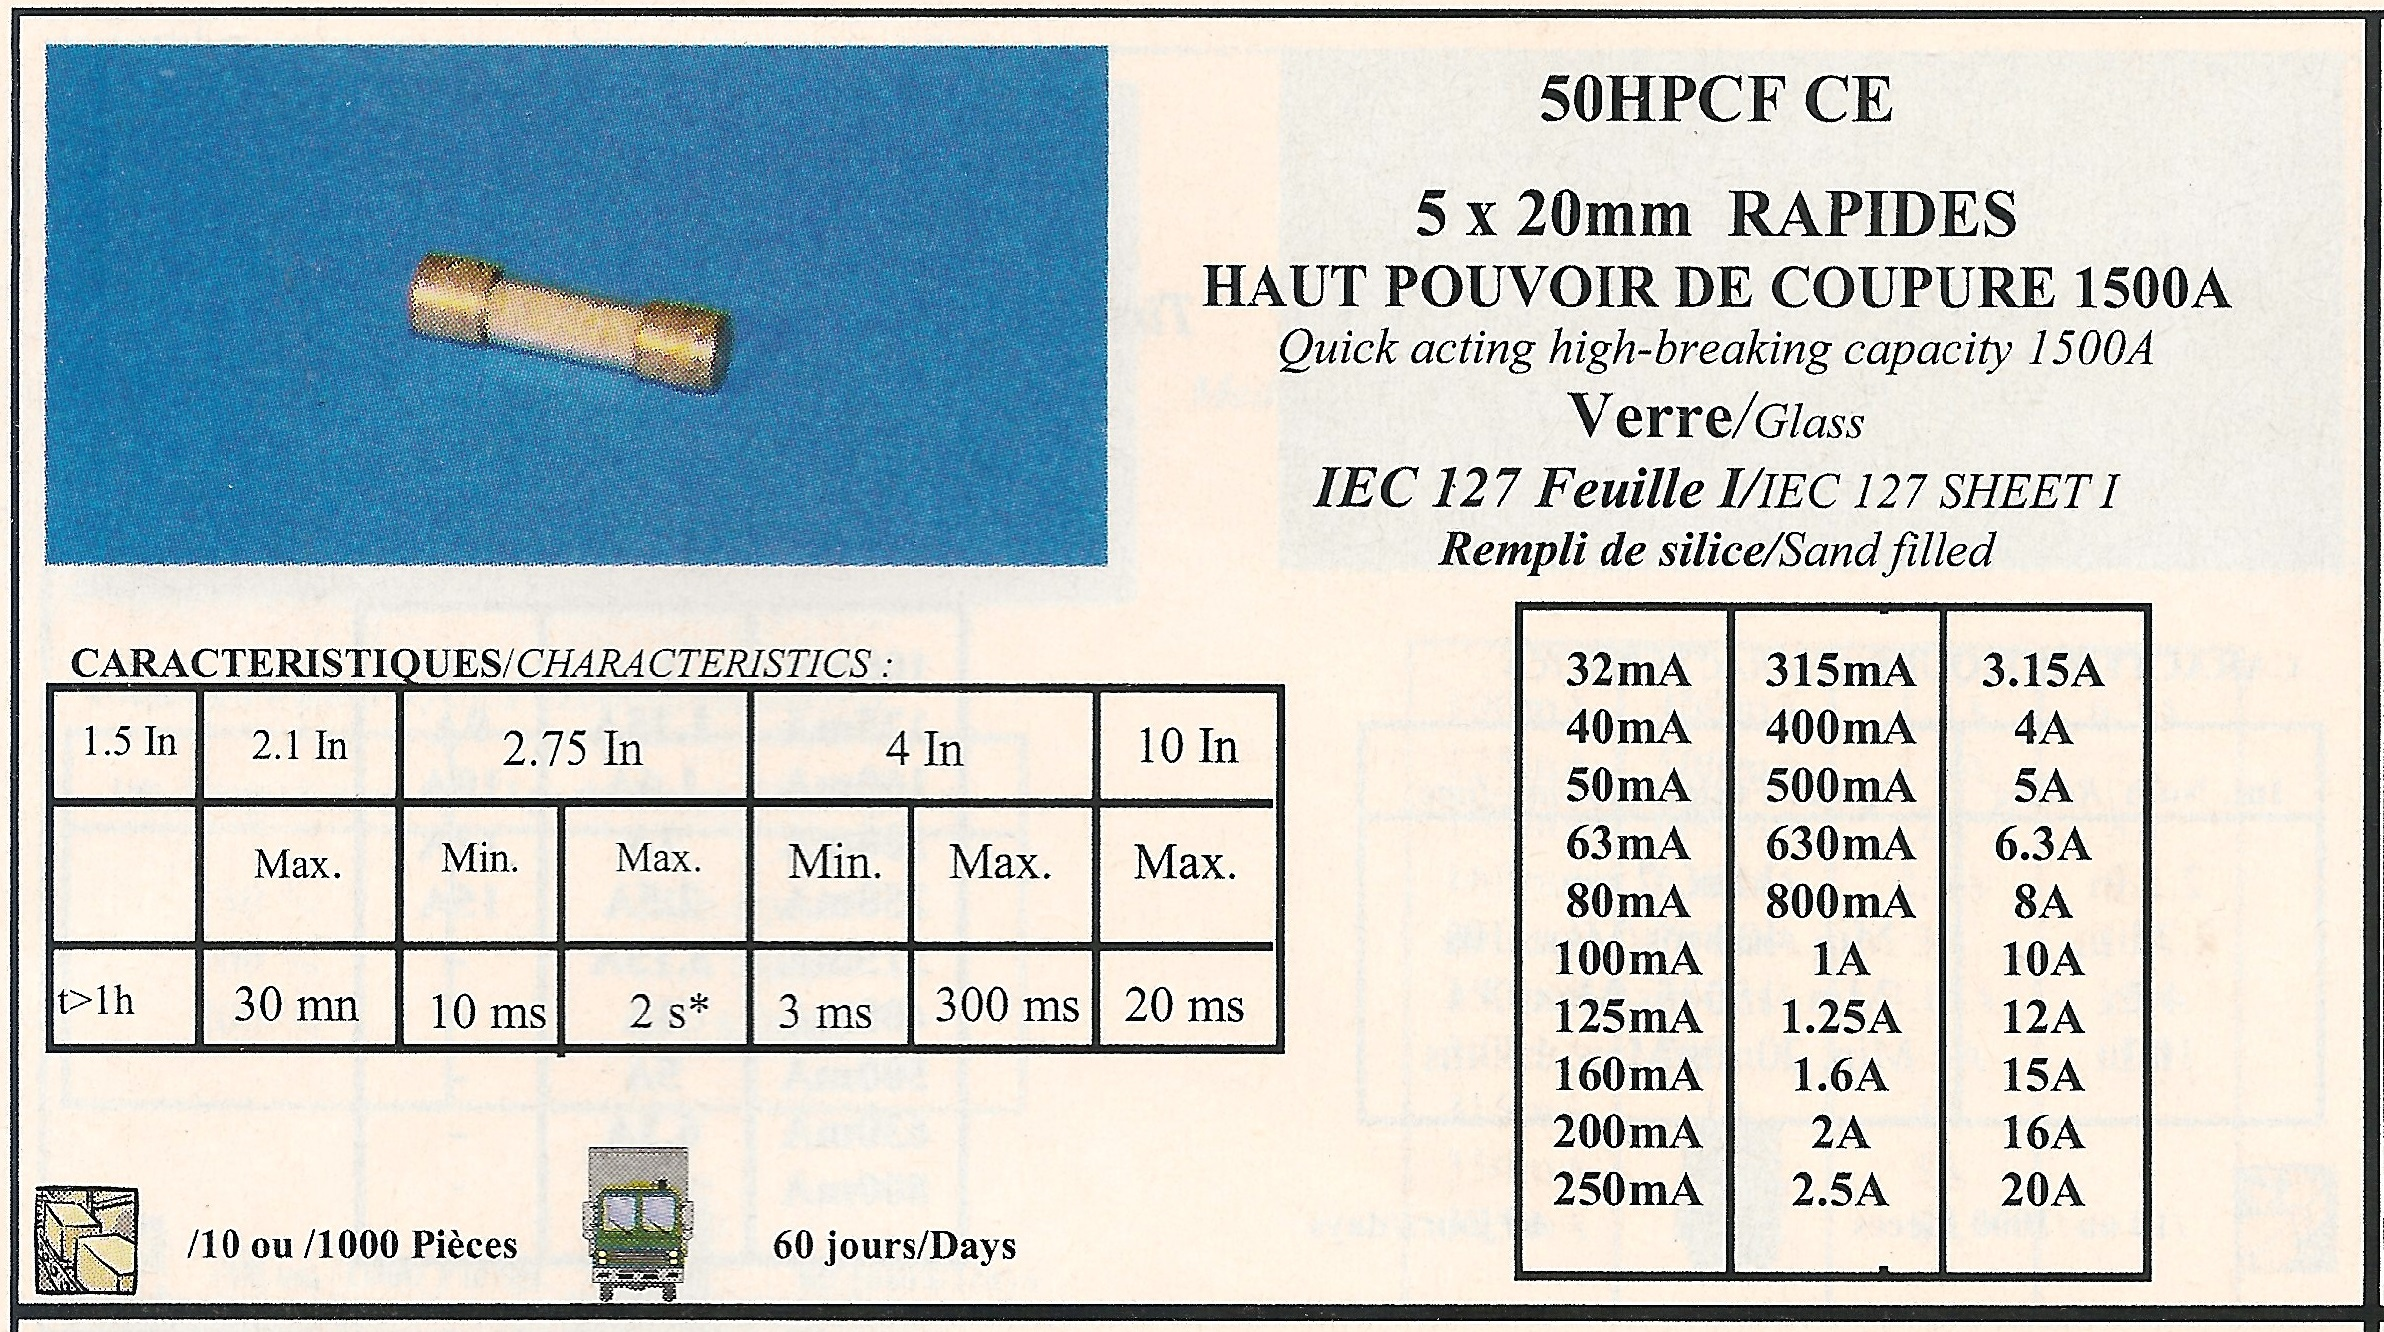 50HPCF CE